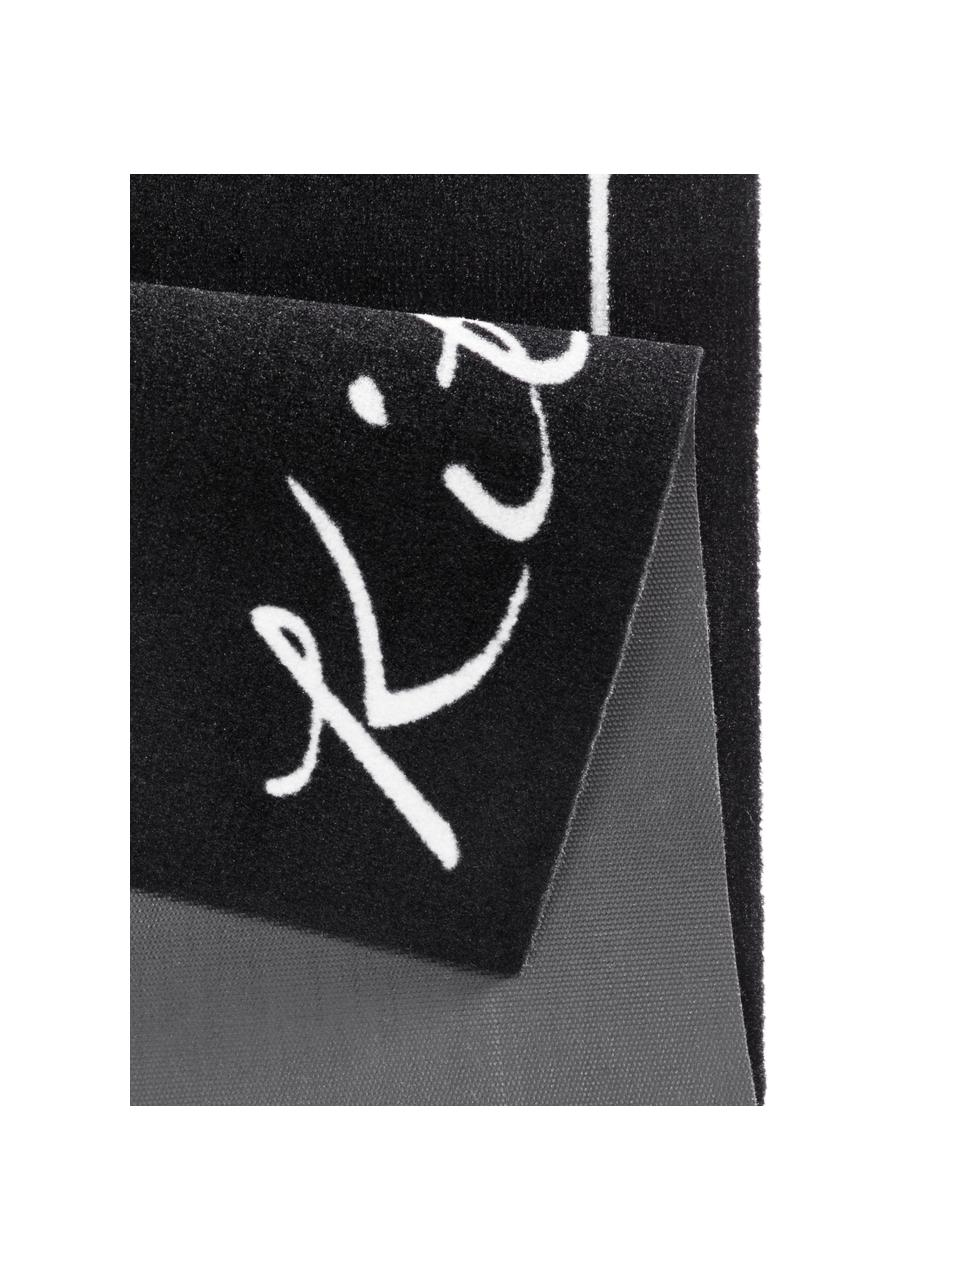 Tapis de couloir antidérapant Kitchen, Noir, blanc